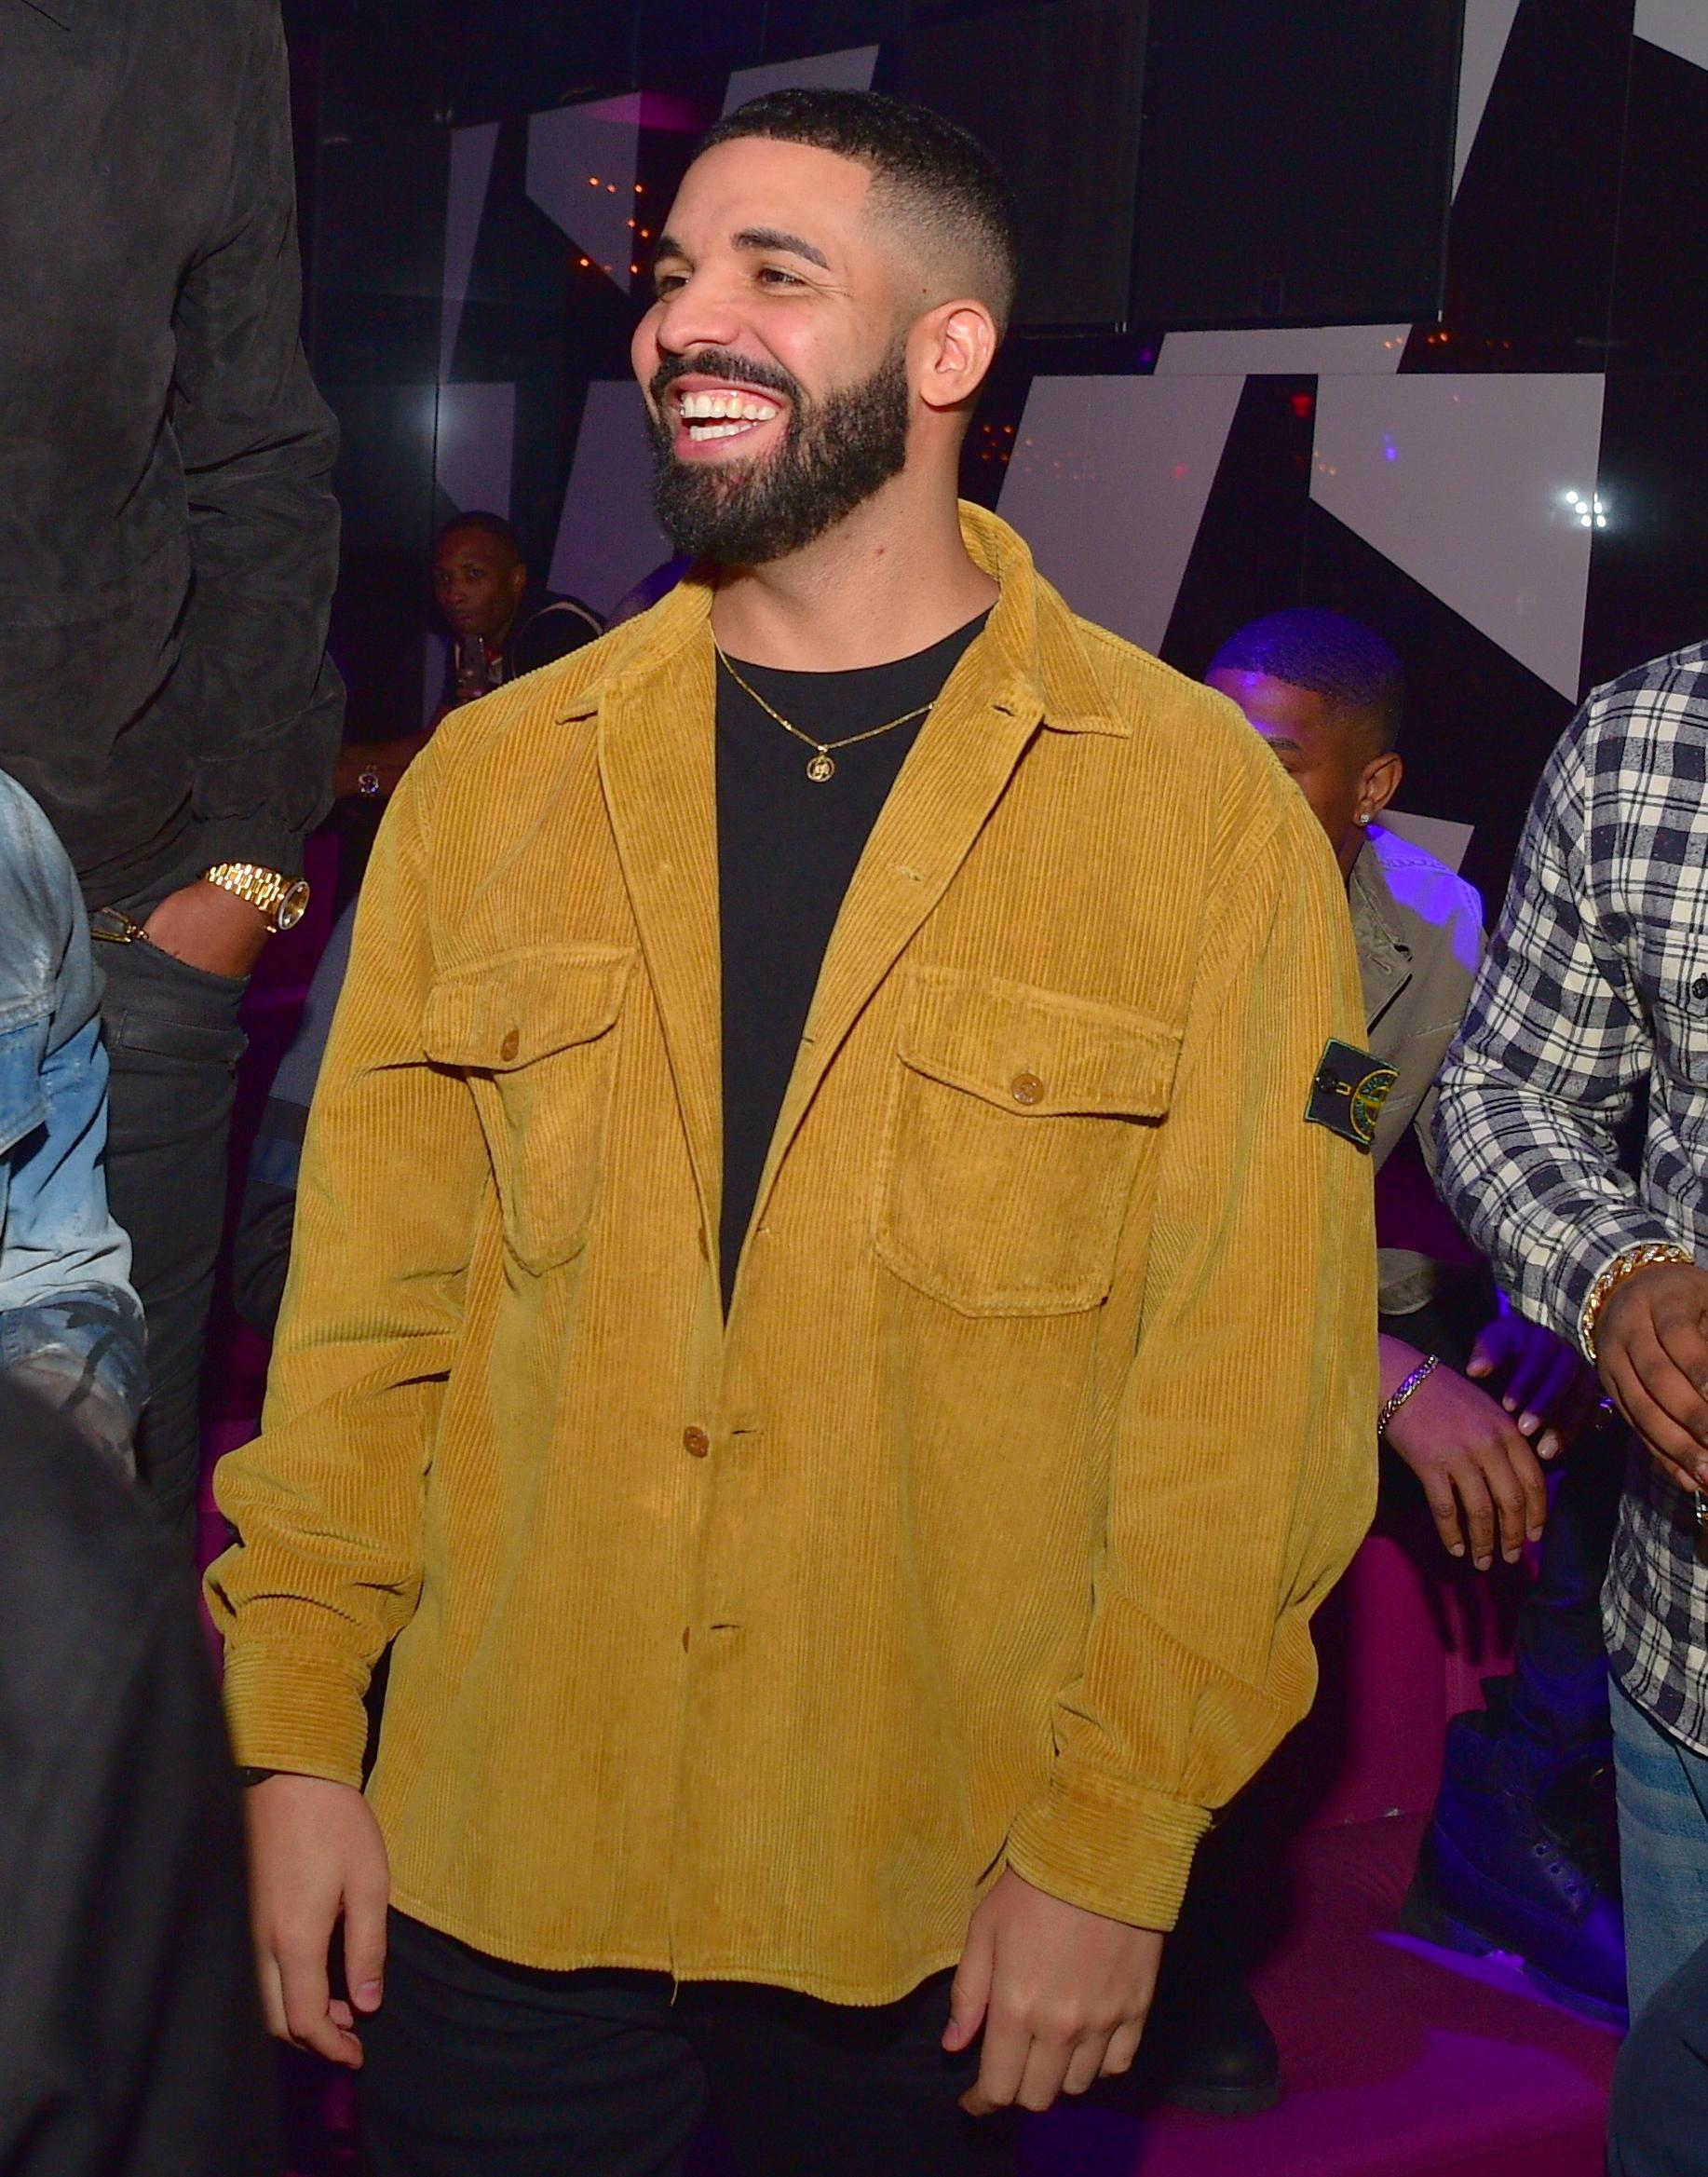 Drake attends Gold Room Saturday Nights at Gold Room in Atlanta  on May 6, 2018.